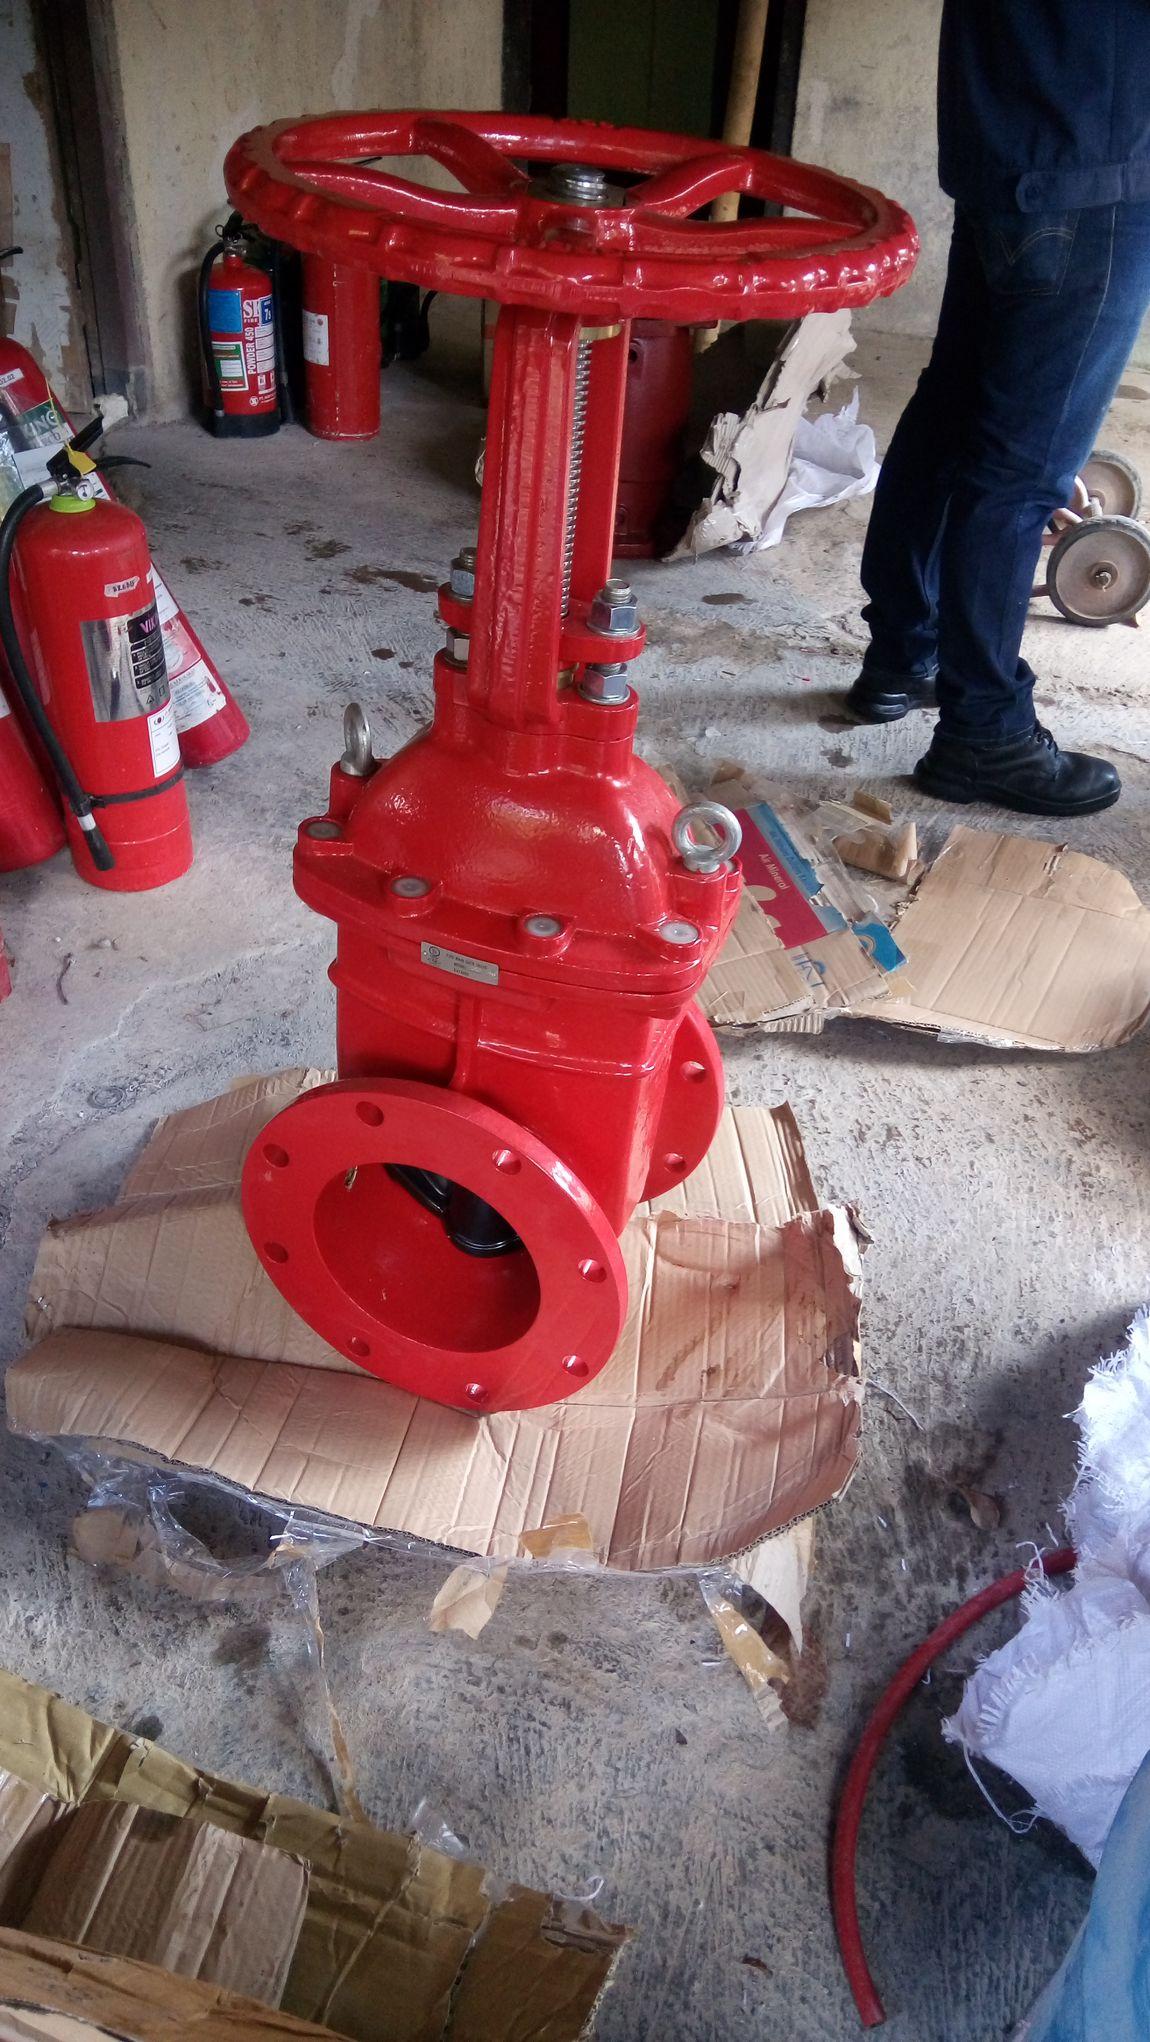 Gatevalve Maincontrolvalve Hydrant Hydrantequipment Firesystem standard national fire protection association NFPA13